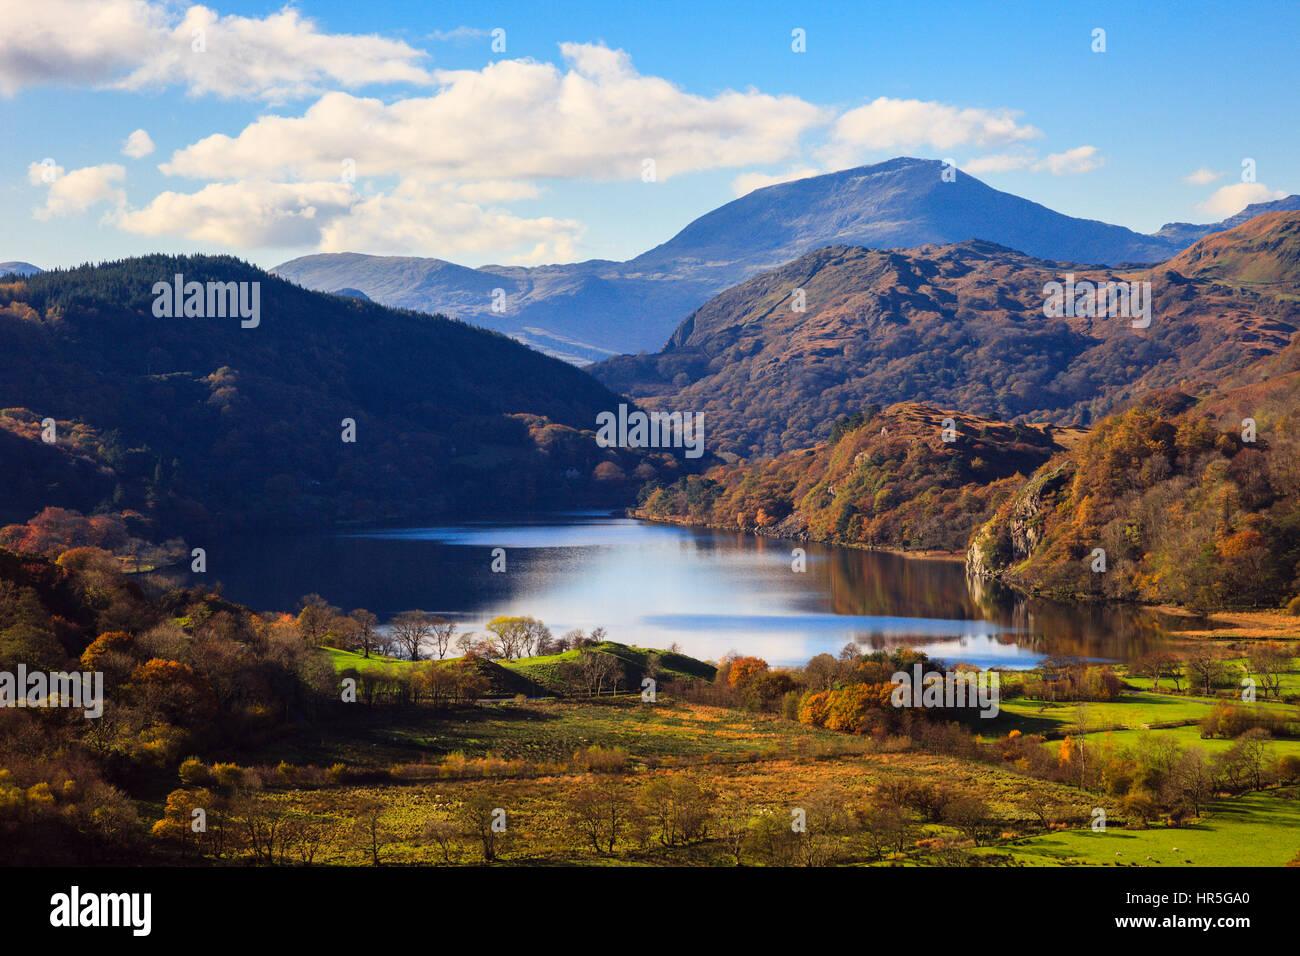 View along valley to Llyn Gwynant lake and Yr Aran in mountains of Snowdonia National Park in autumn. Nant Gwynant, Gwynedd, North Wales, UK, Britain Stock Photo